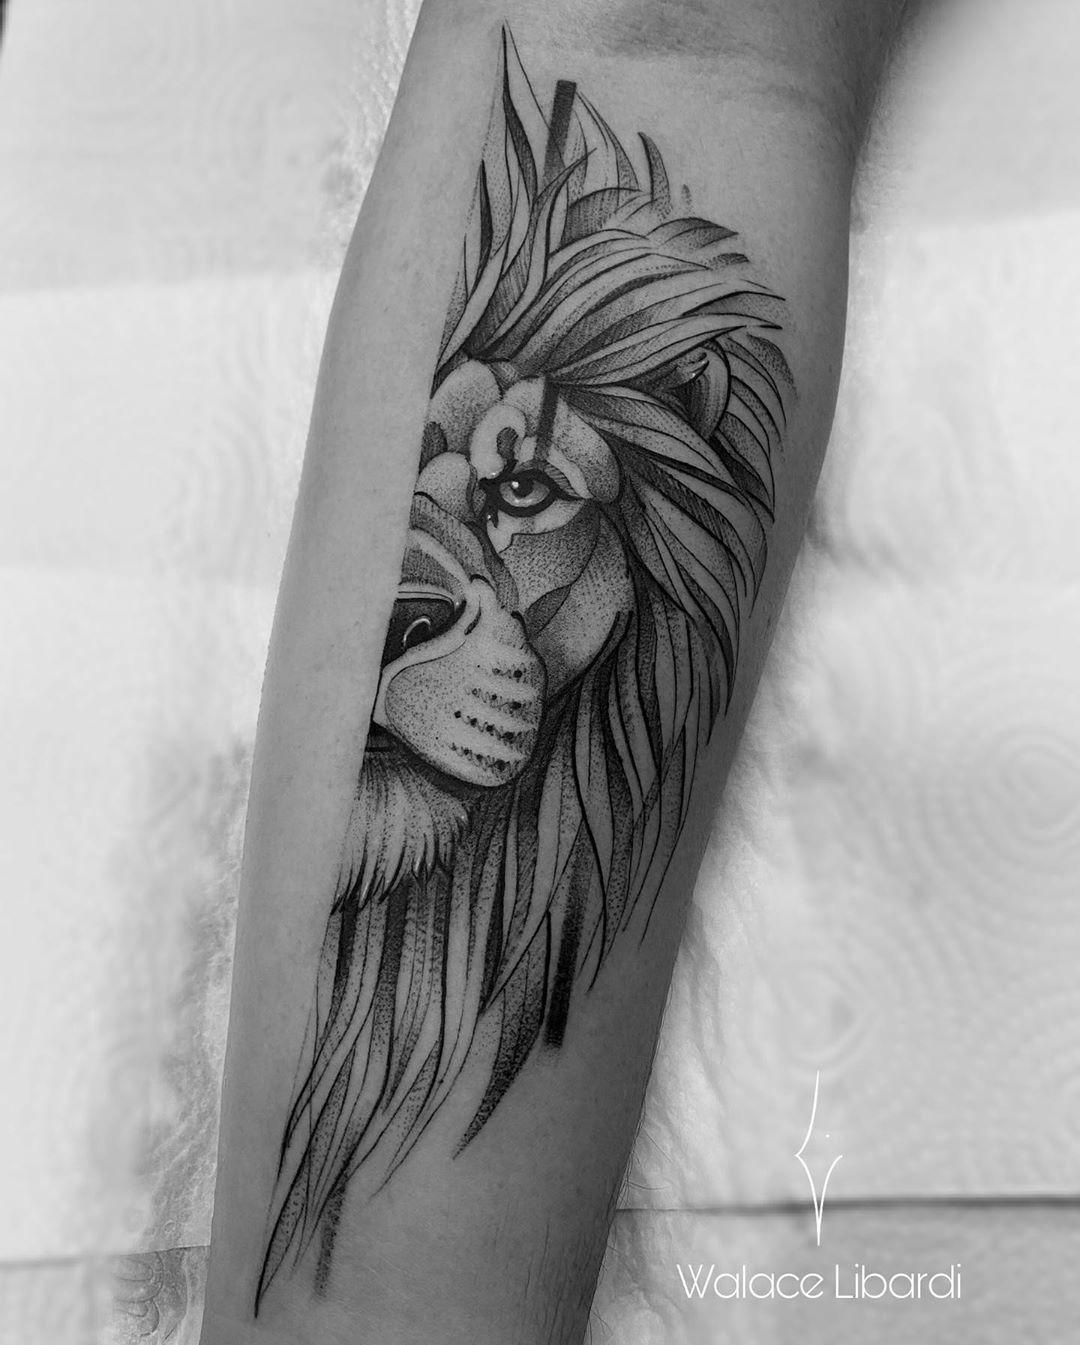 "Walace Libardi on Instagram: ""🦁 #lion #leao #blackwork #electricink #dotwork #walacelibardi #blackwork #tatuagem #Tattoo #Tattooing #Tattooed#TattooWork #TattooWorkers…"""